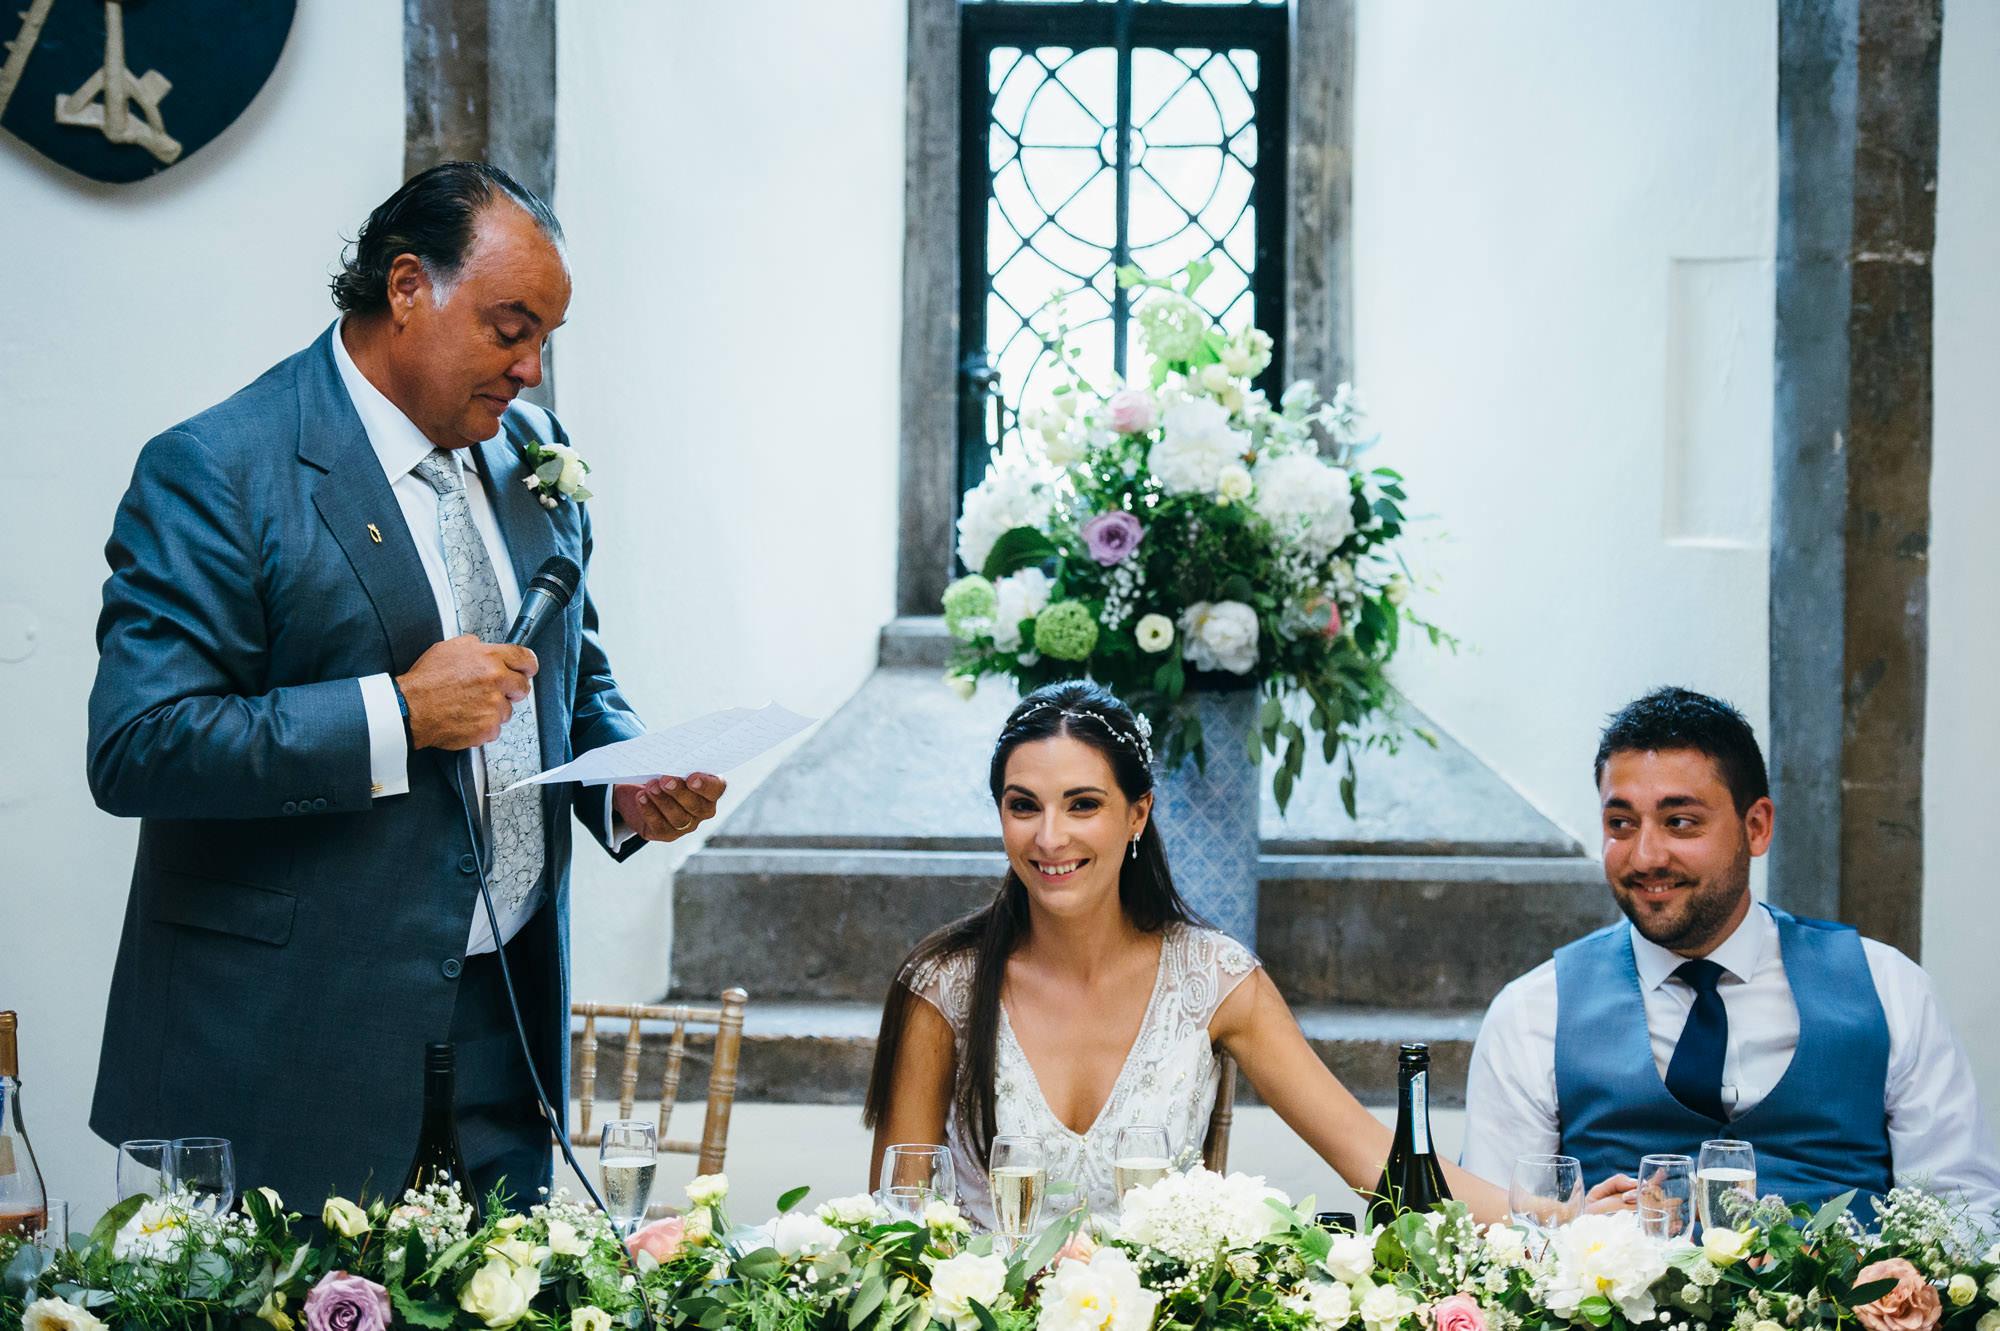 Wedding speeches at Bishops Palace